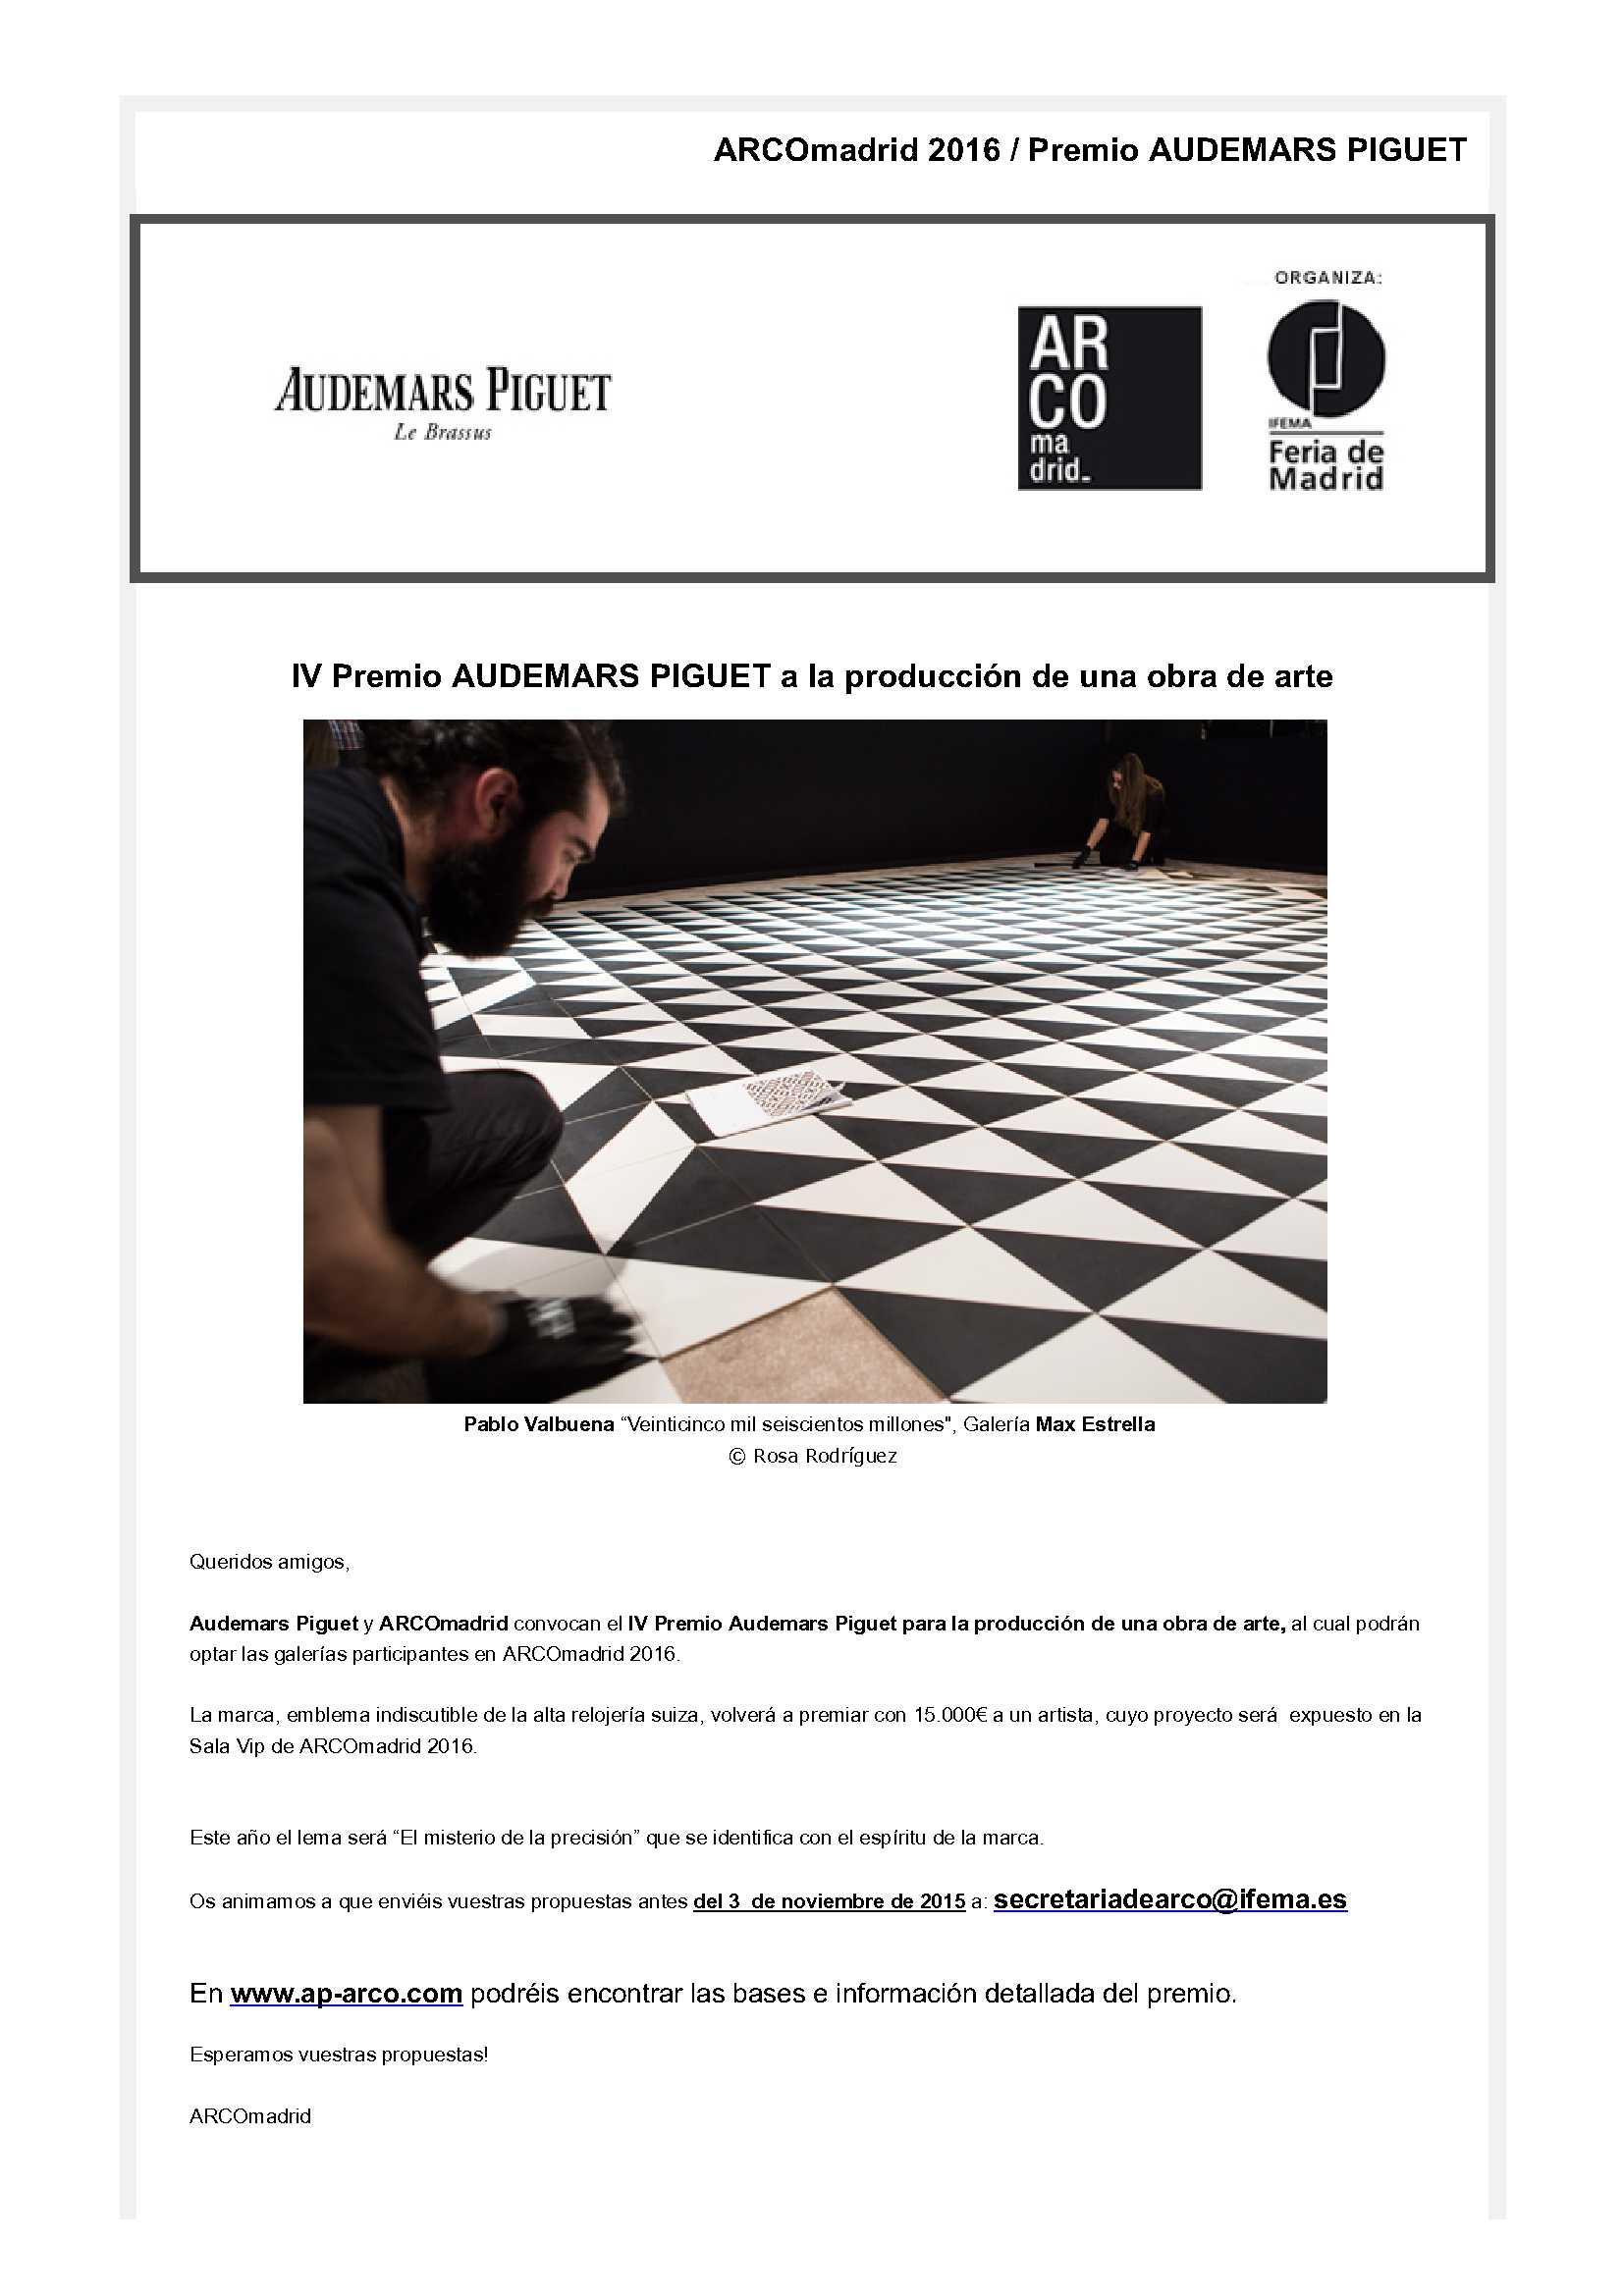 IFEMA Newsletters http://www.ifema.es/newsletters/arco/2016/ap.html